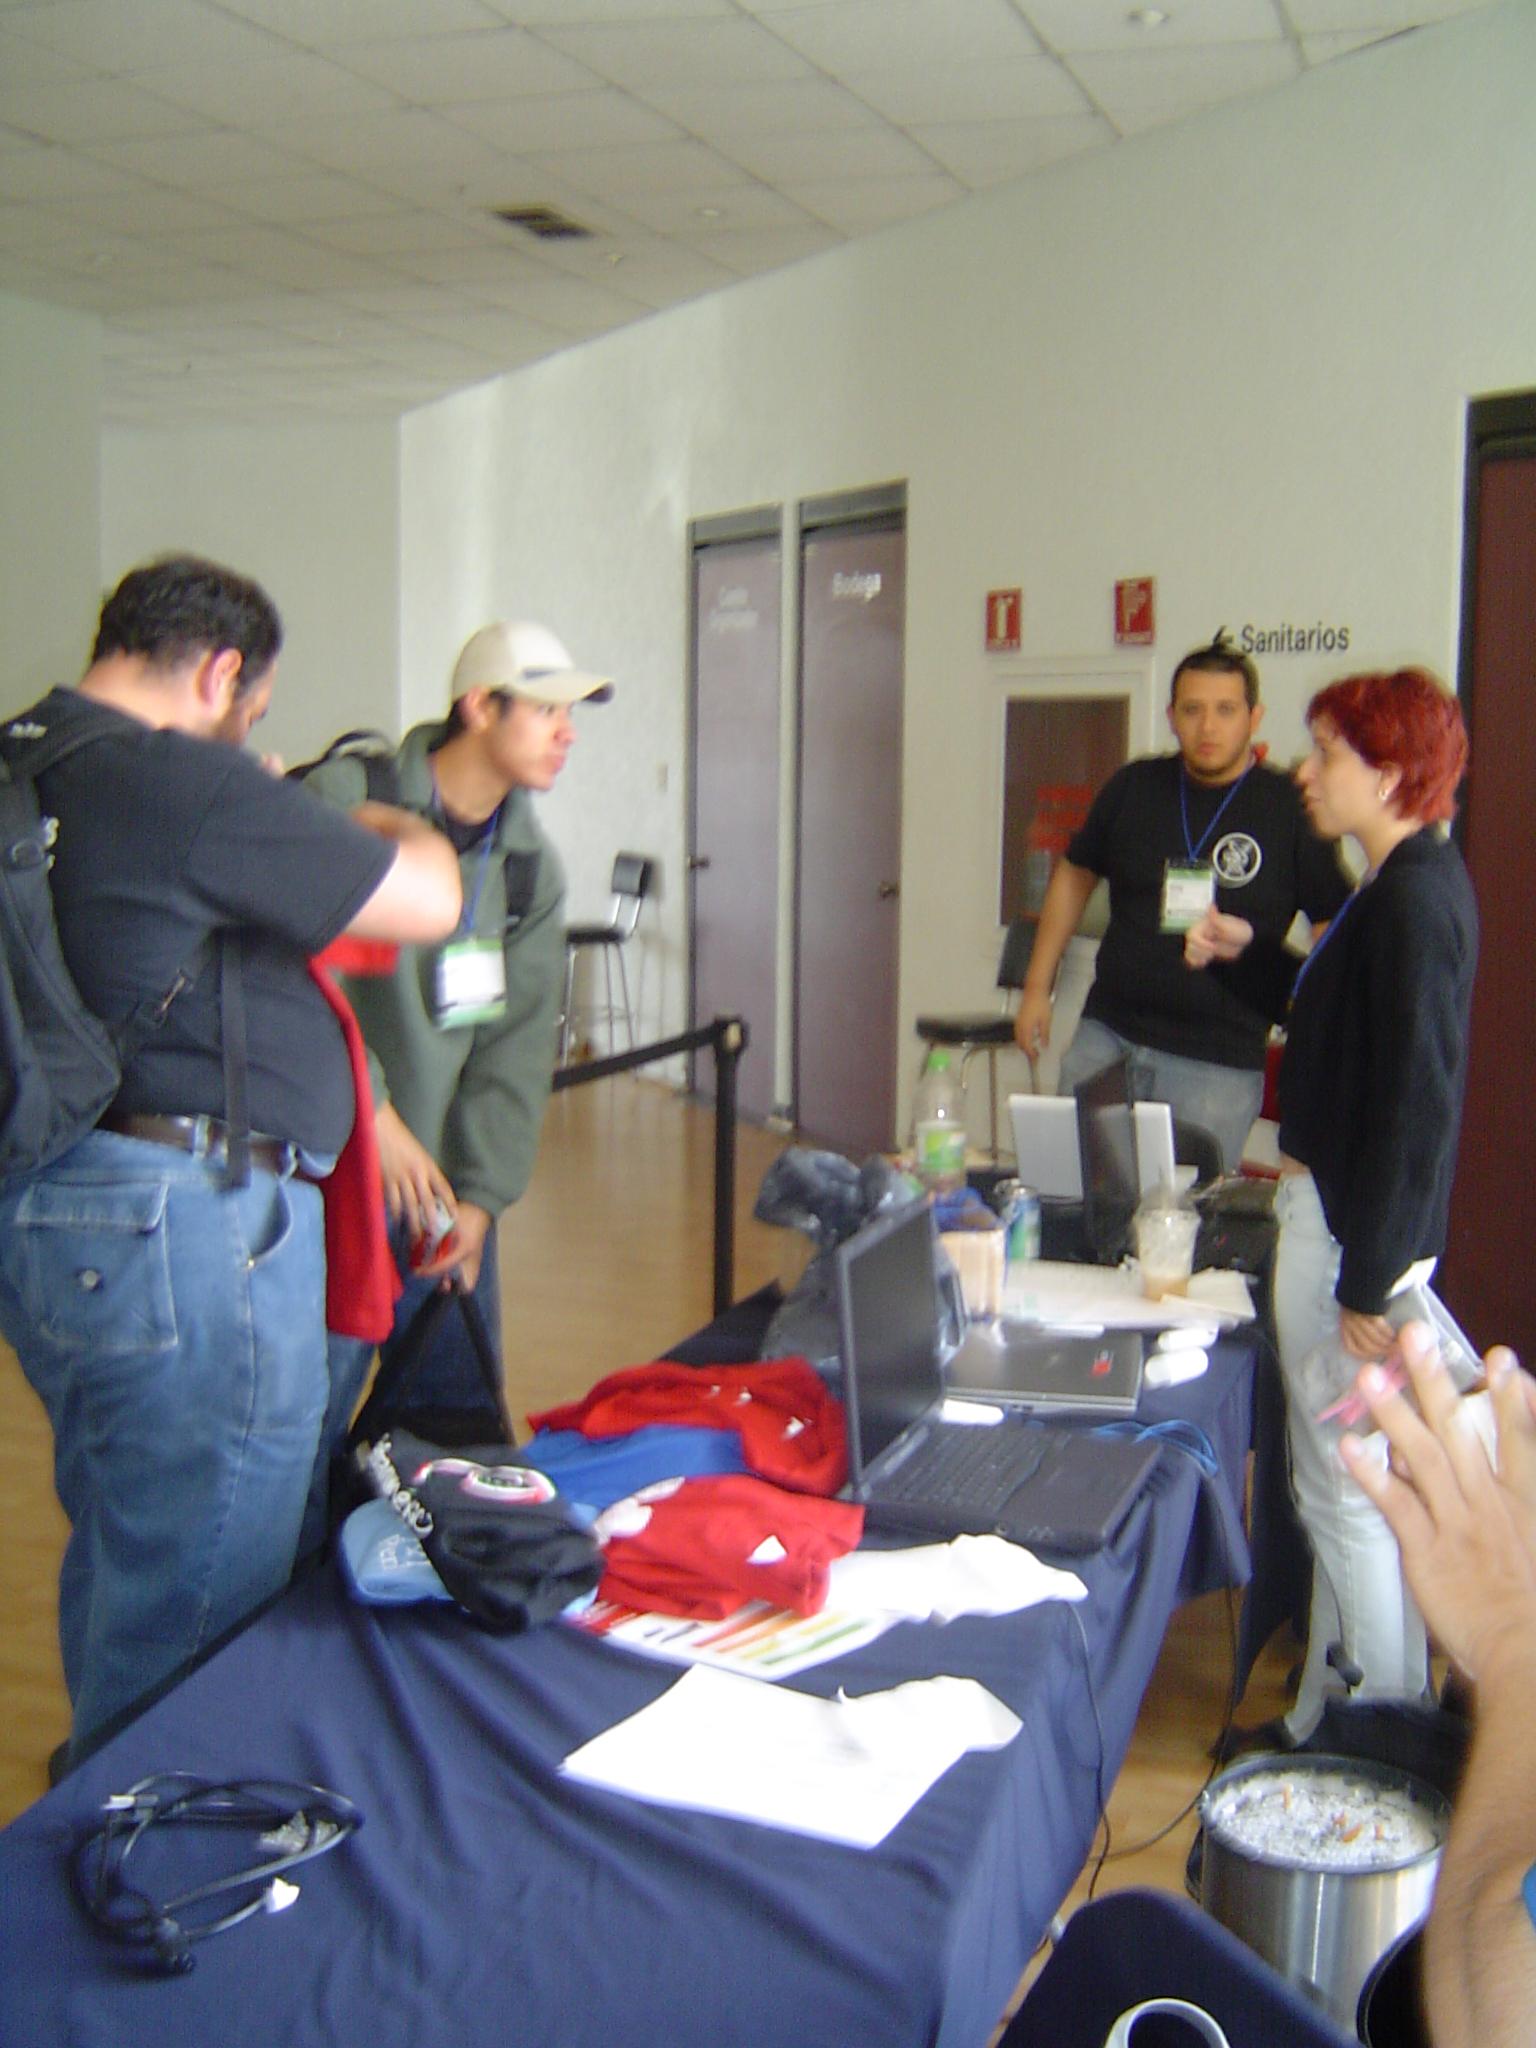 Selling Debian and Perl T-shirts, with Zimri, Damog and Nanda